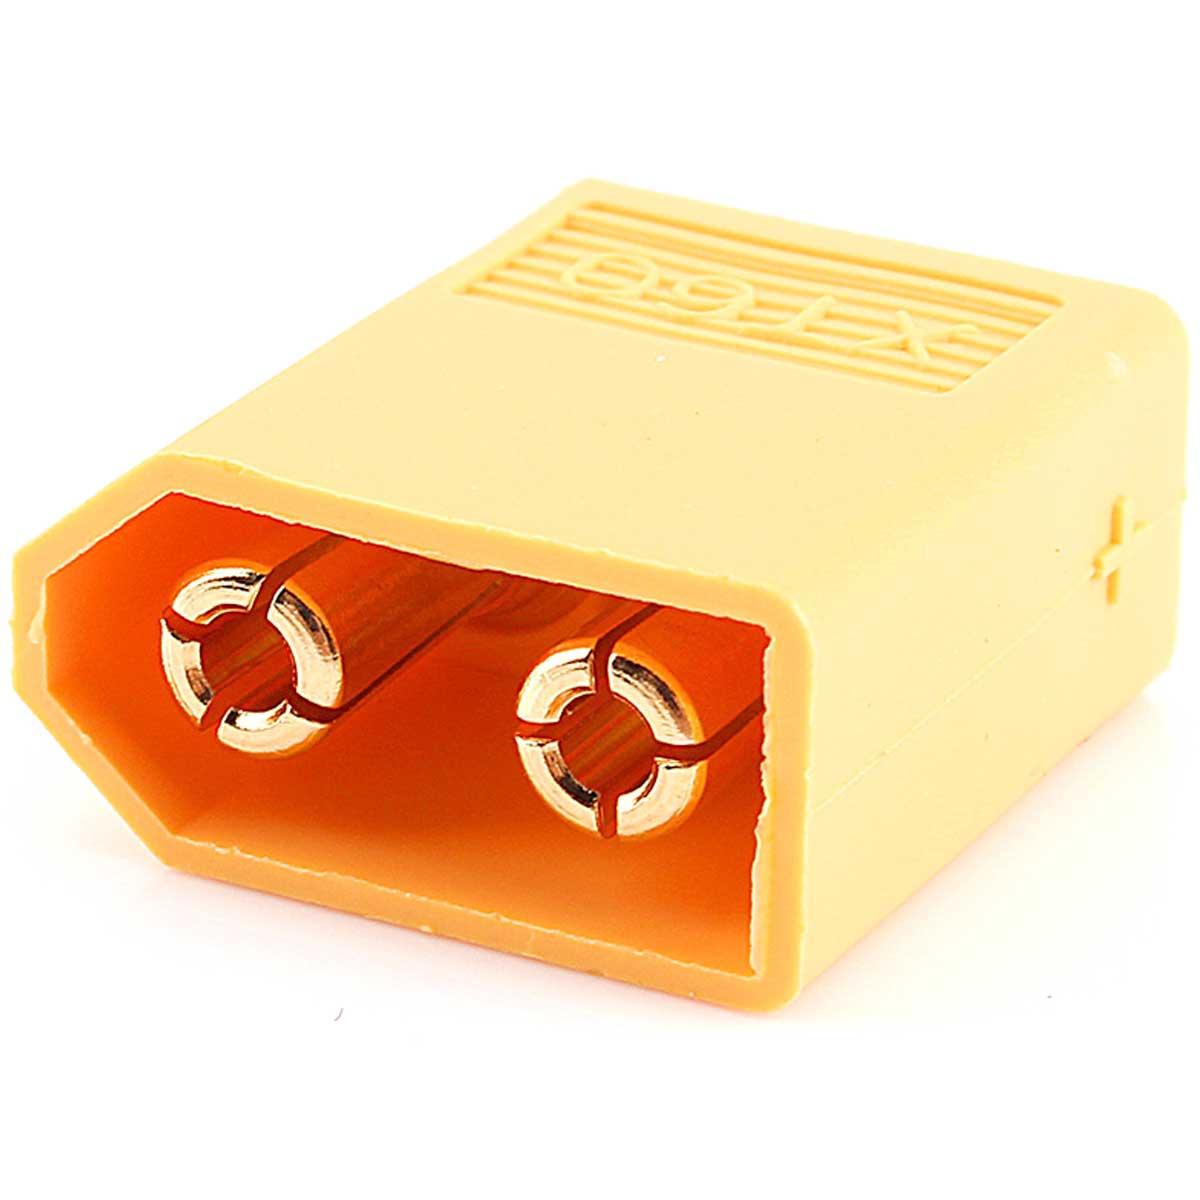 2 Pares de Conector XT 60 Macho e Fêmea   Conector Lipo